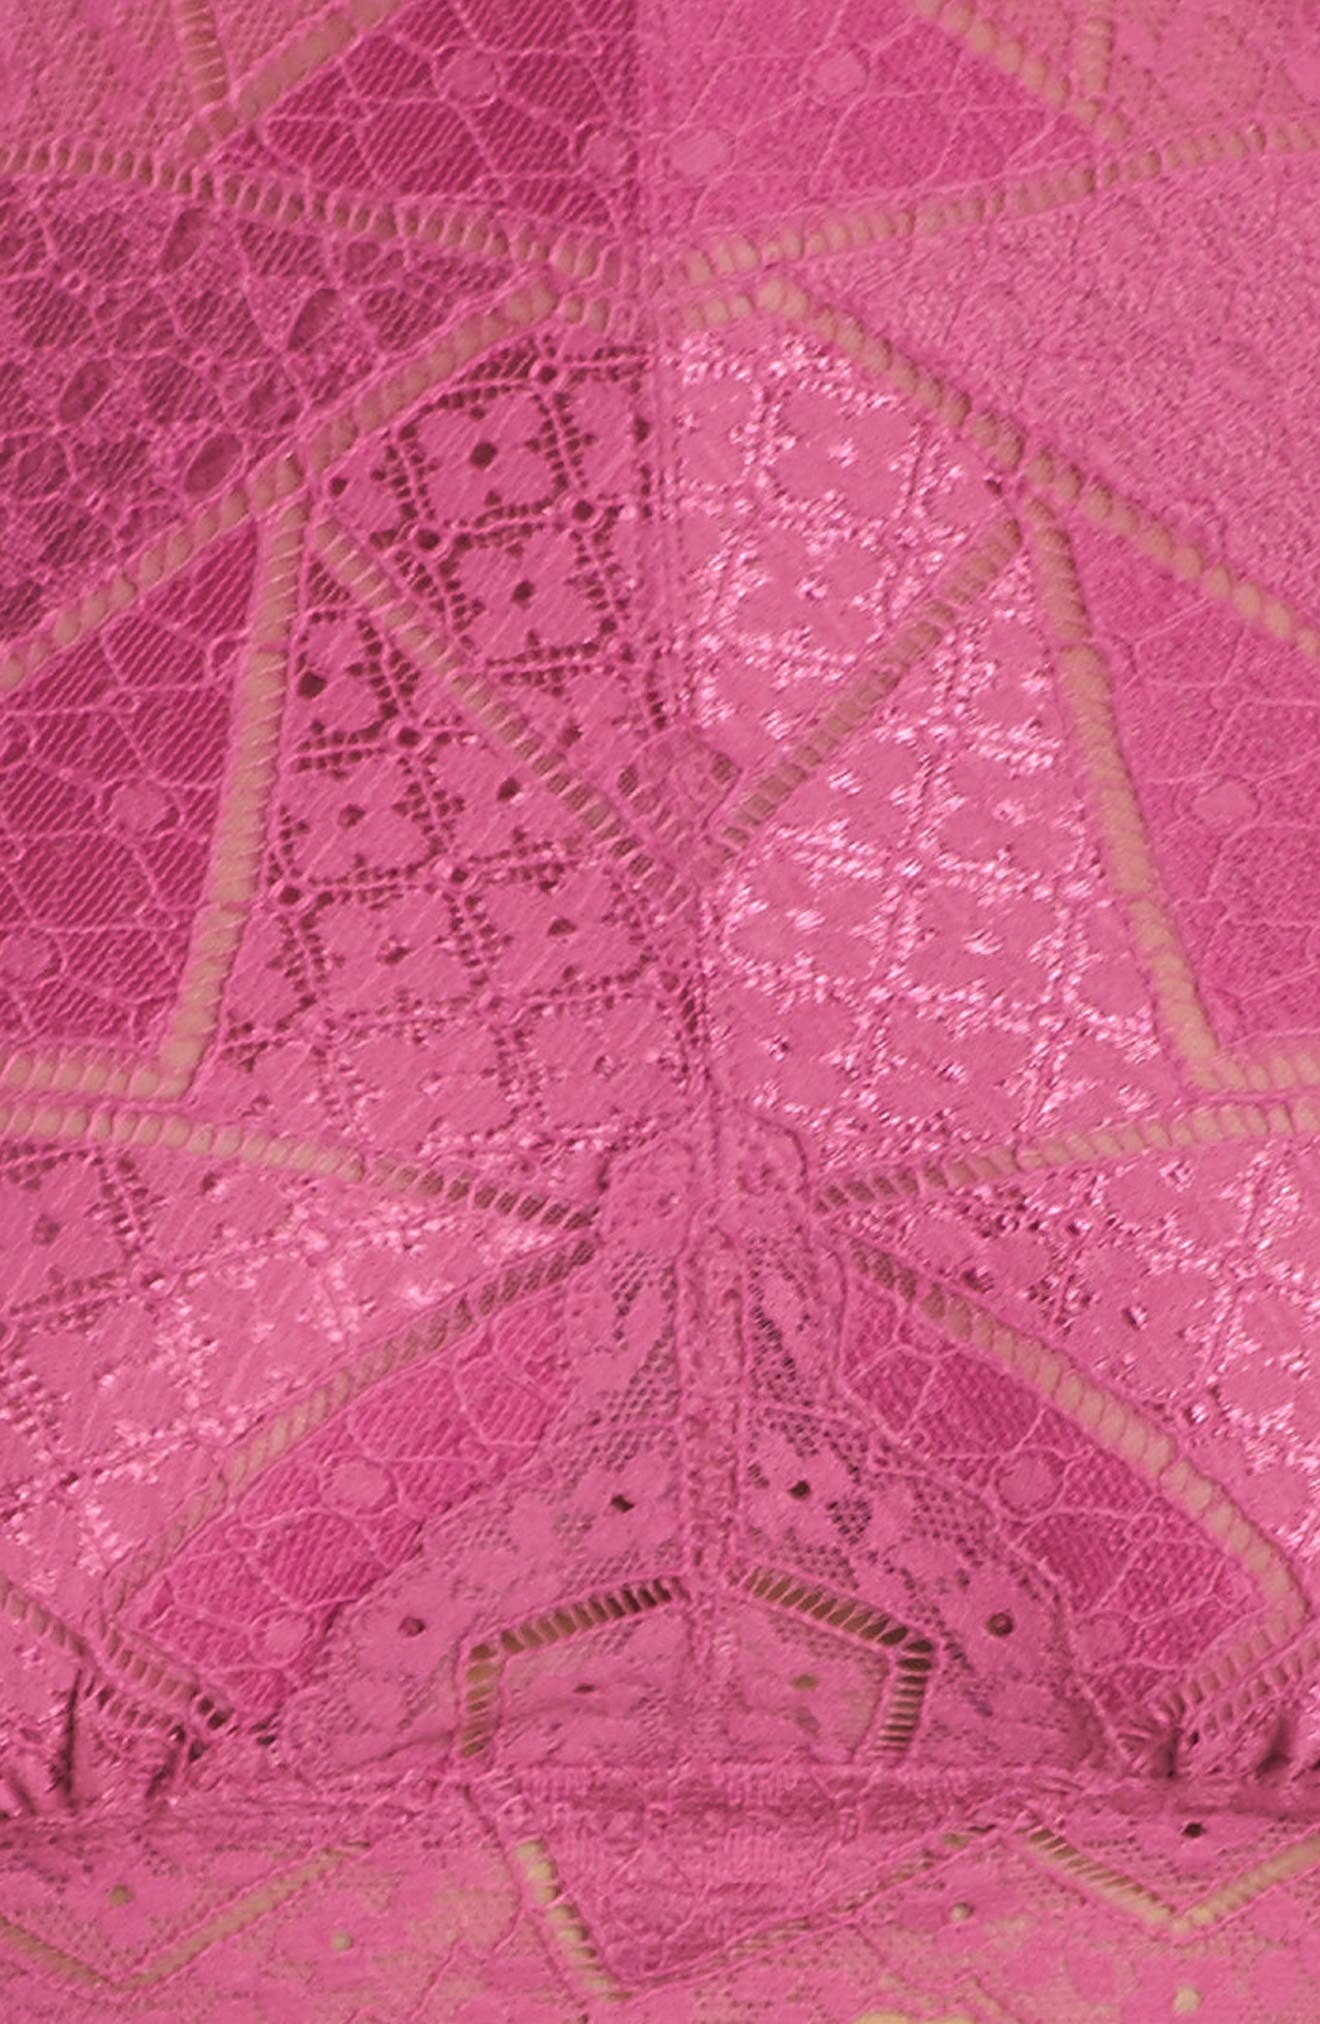 Intimately FP Moonstruck Lace Longline Halter Bralette,                             Alternate thumbnail 15, color,